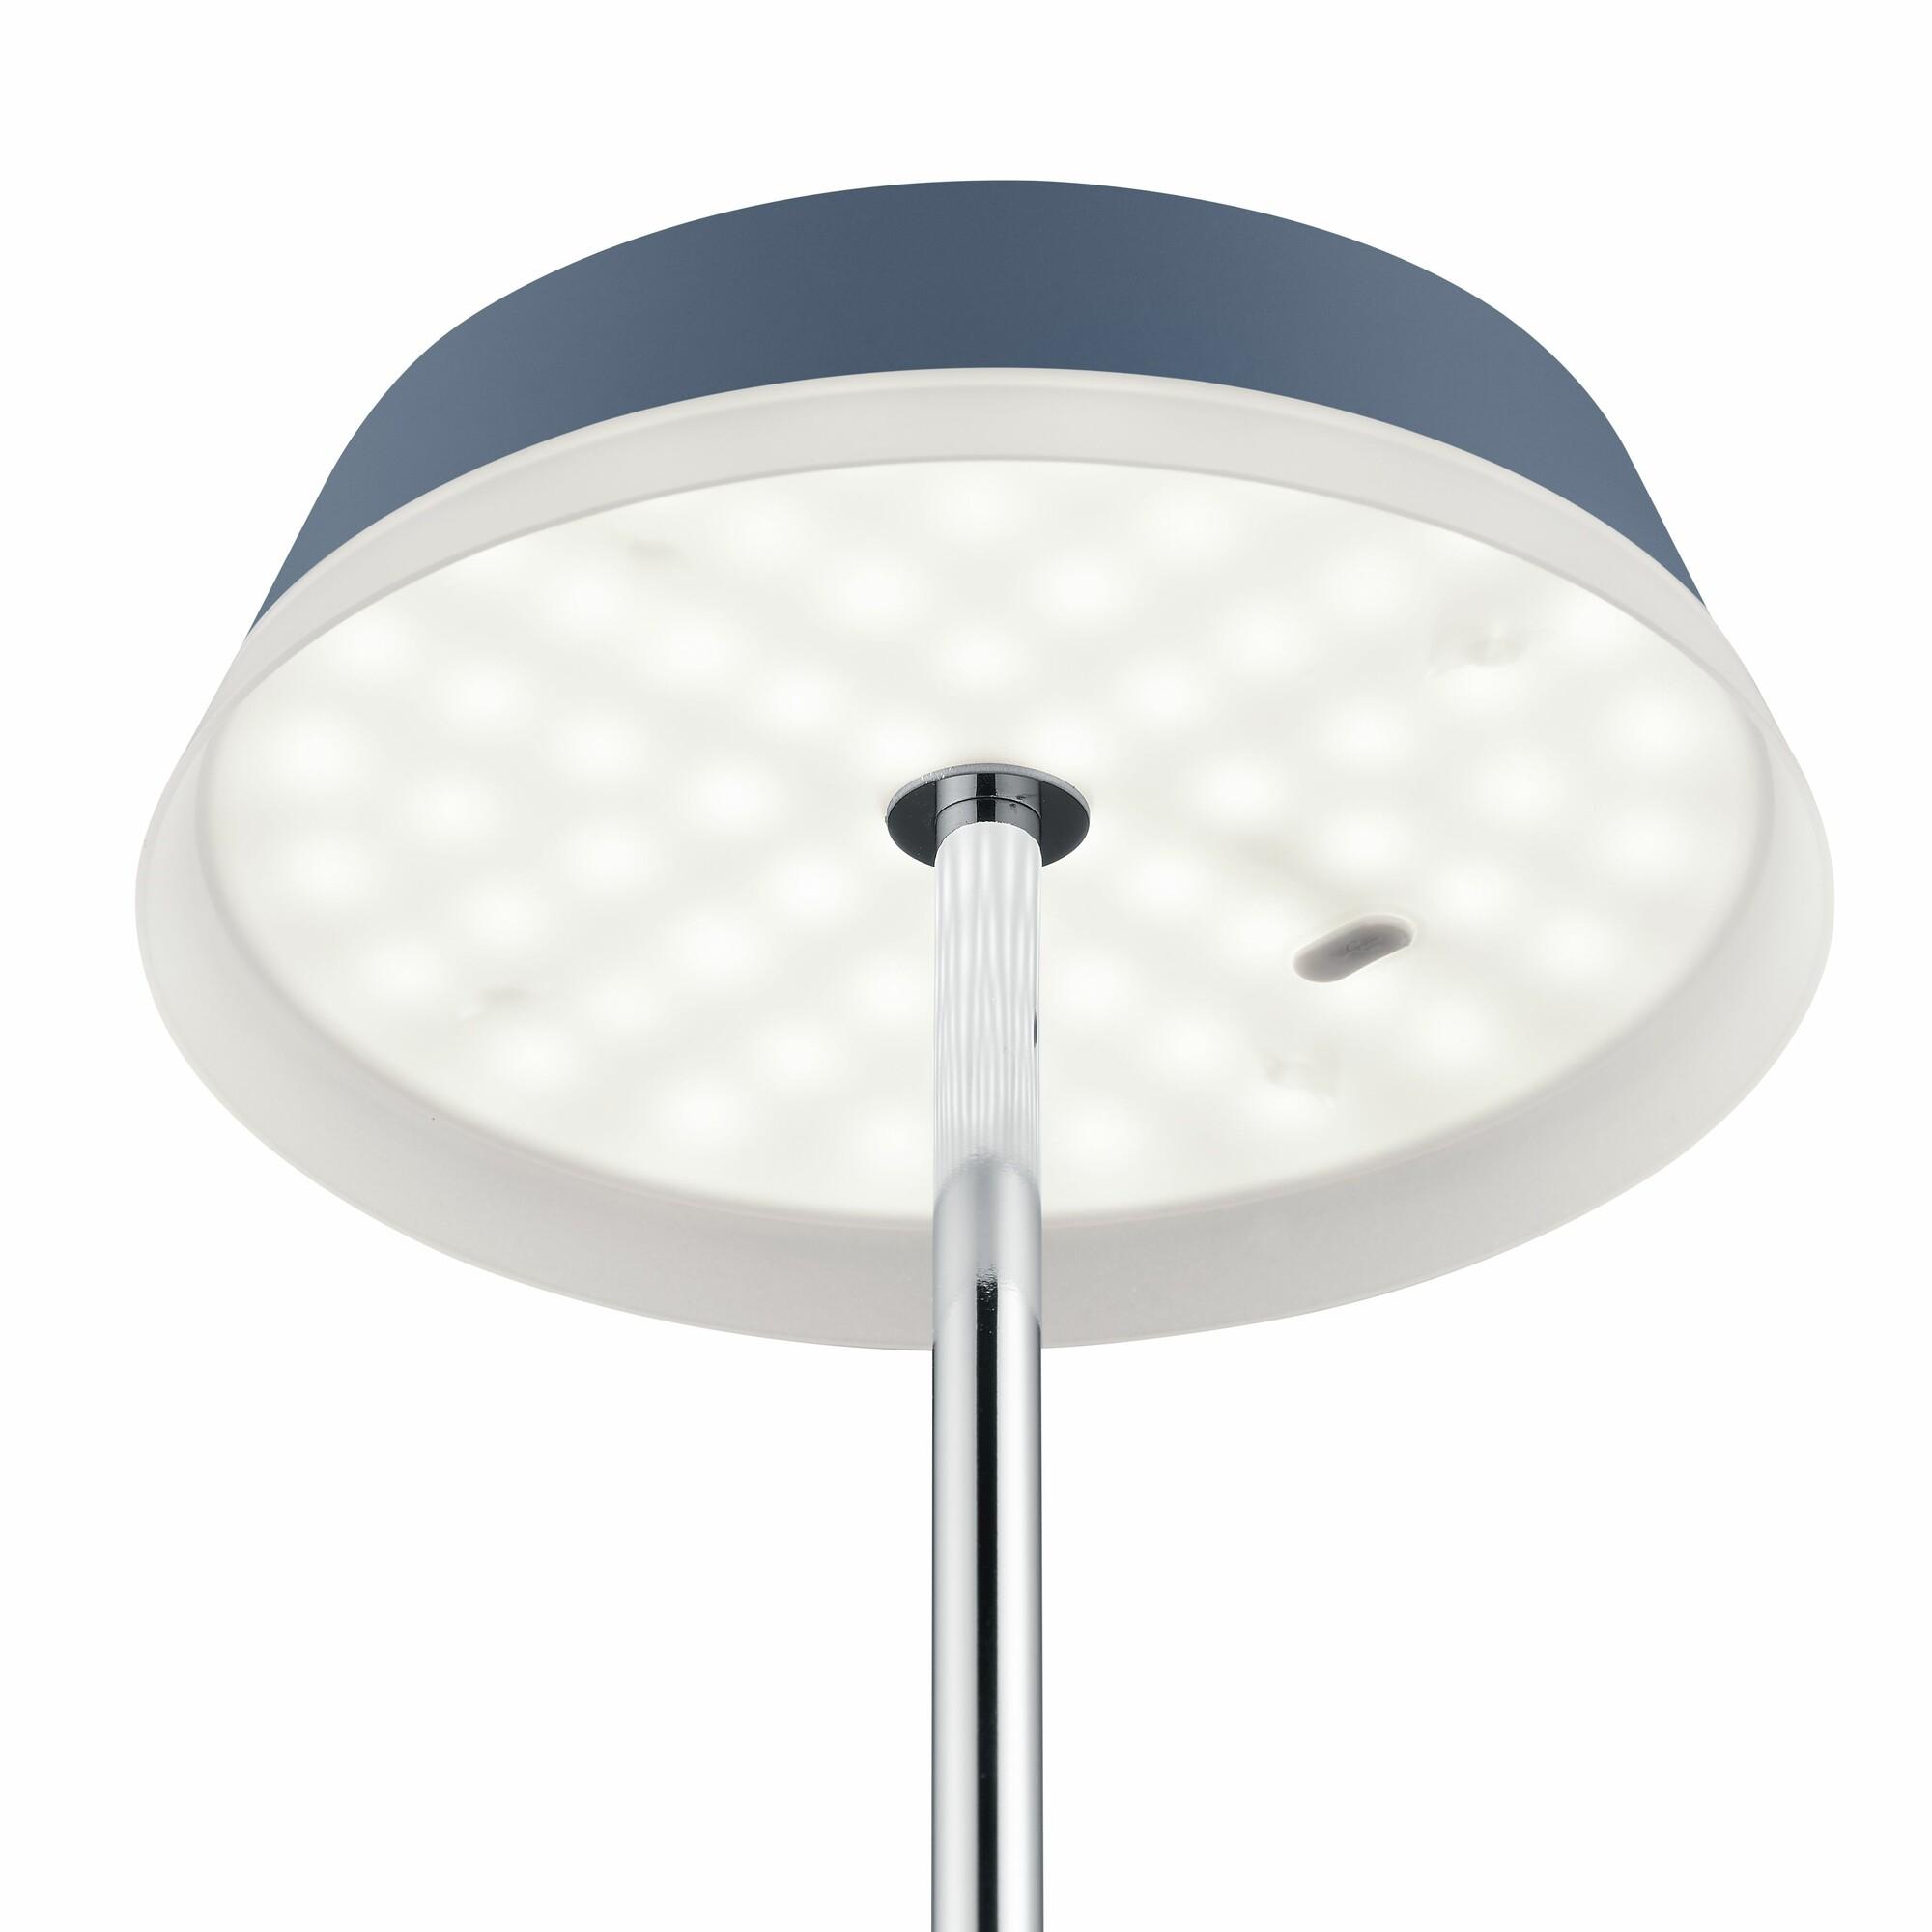 JOY Tafellamp LED 1x1,8W/200lm Antraciet